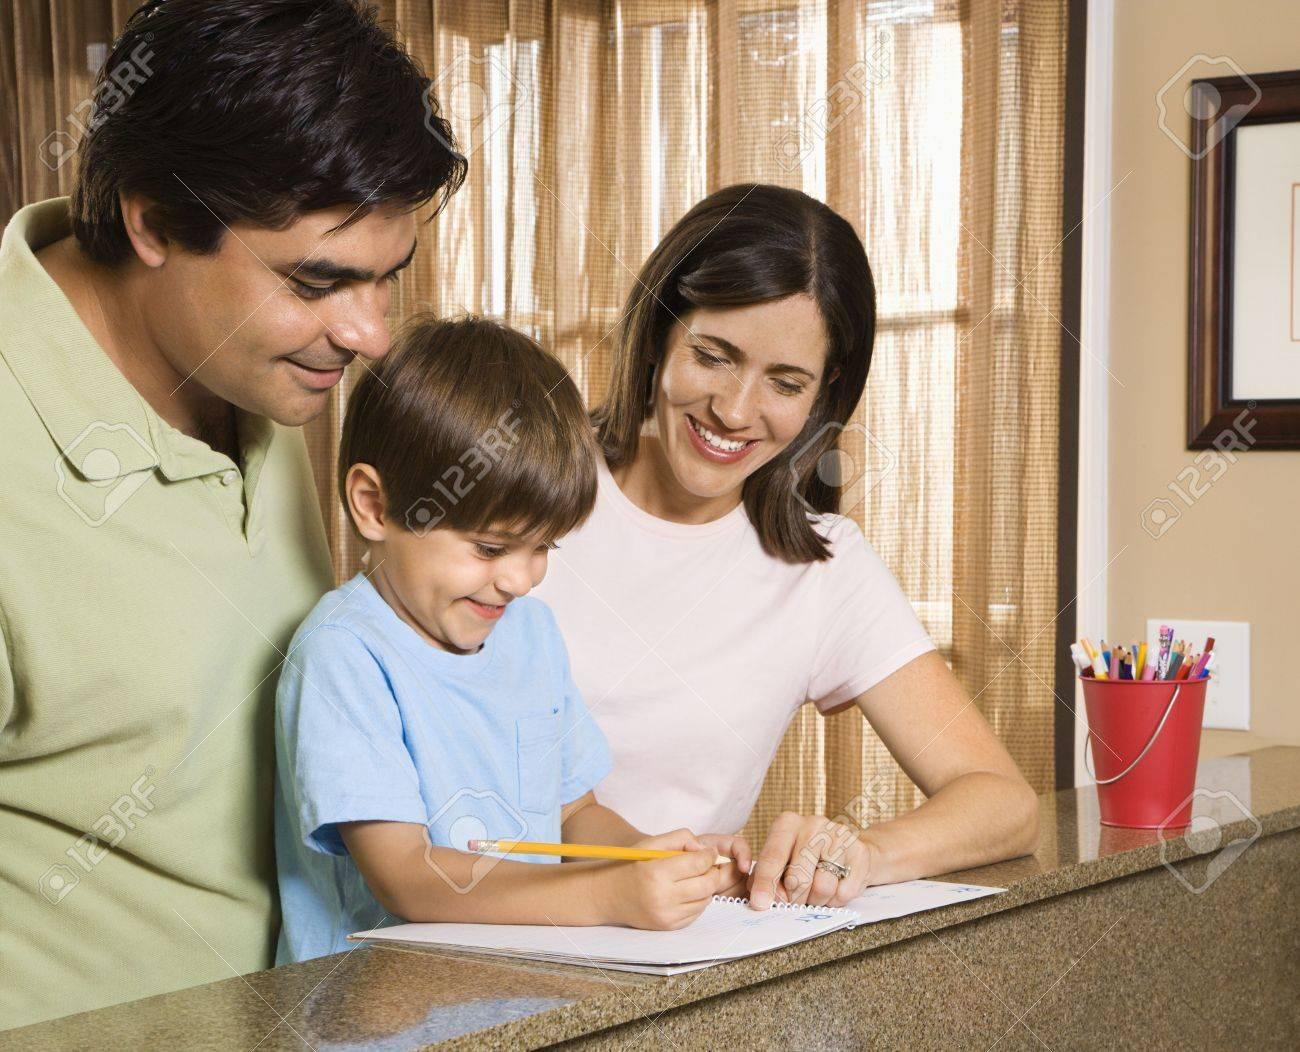 Parents homework